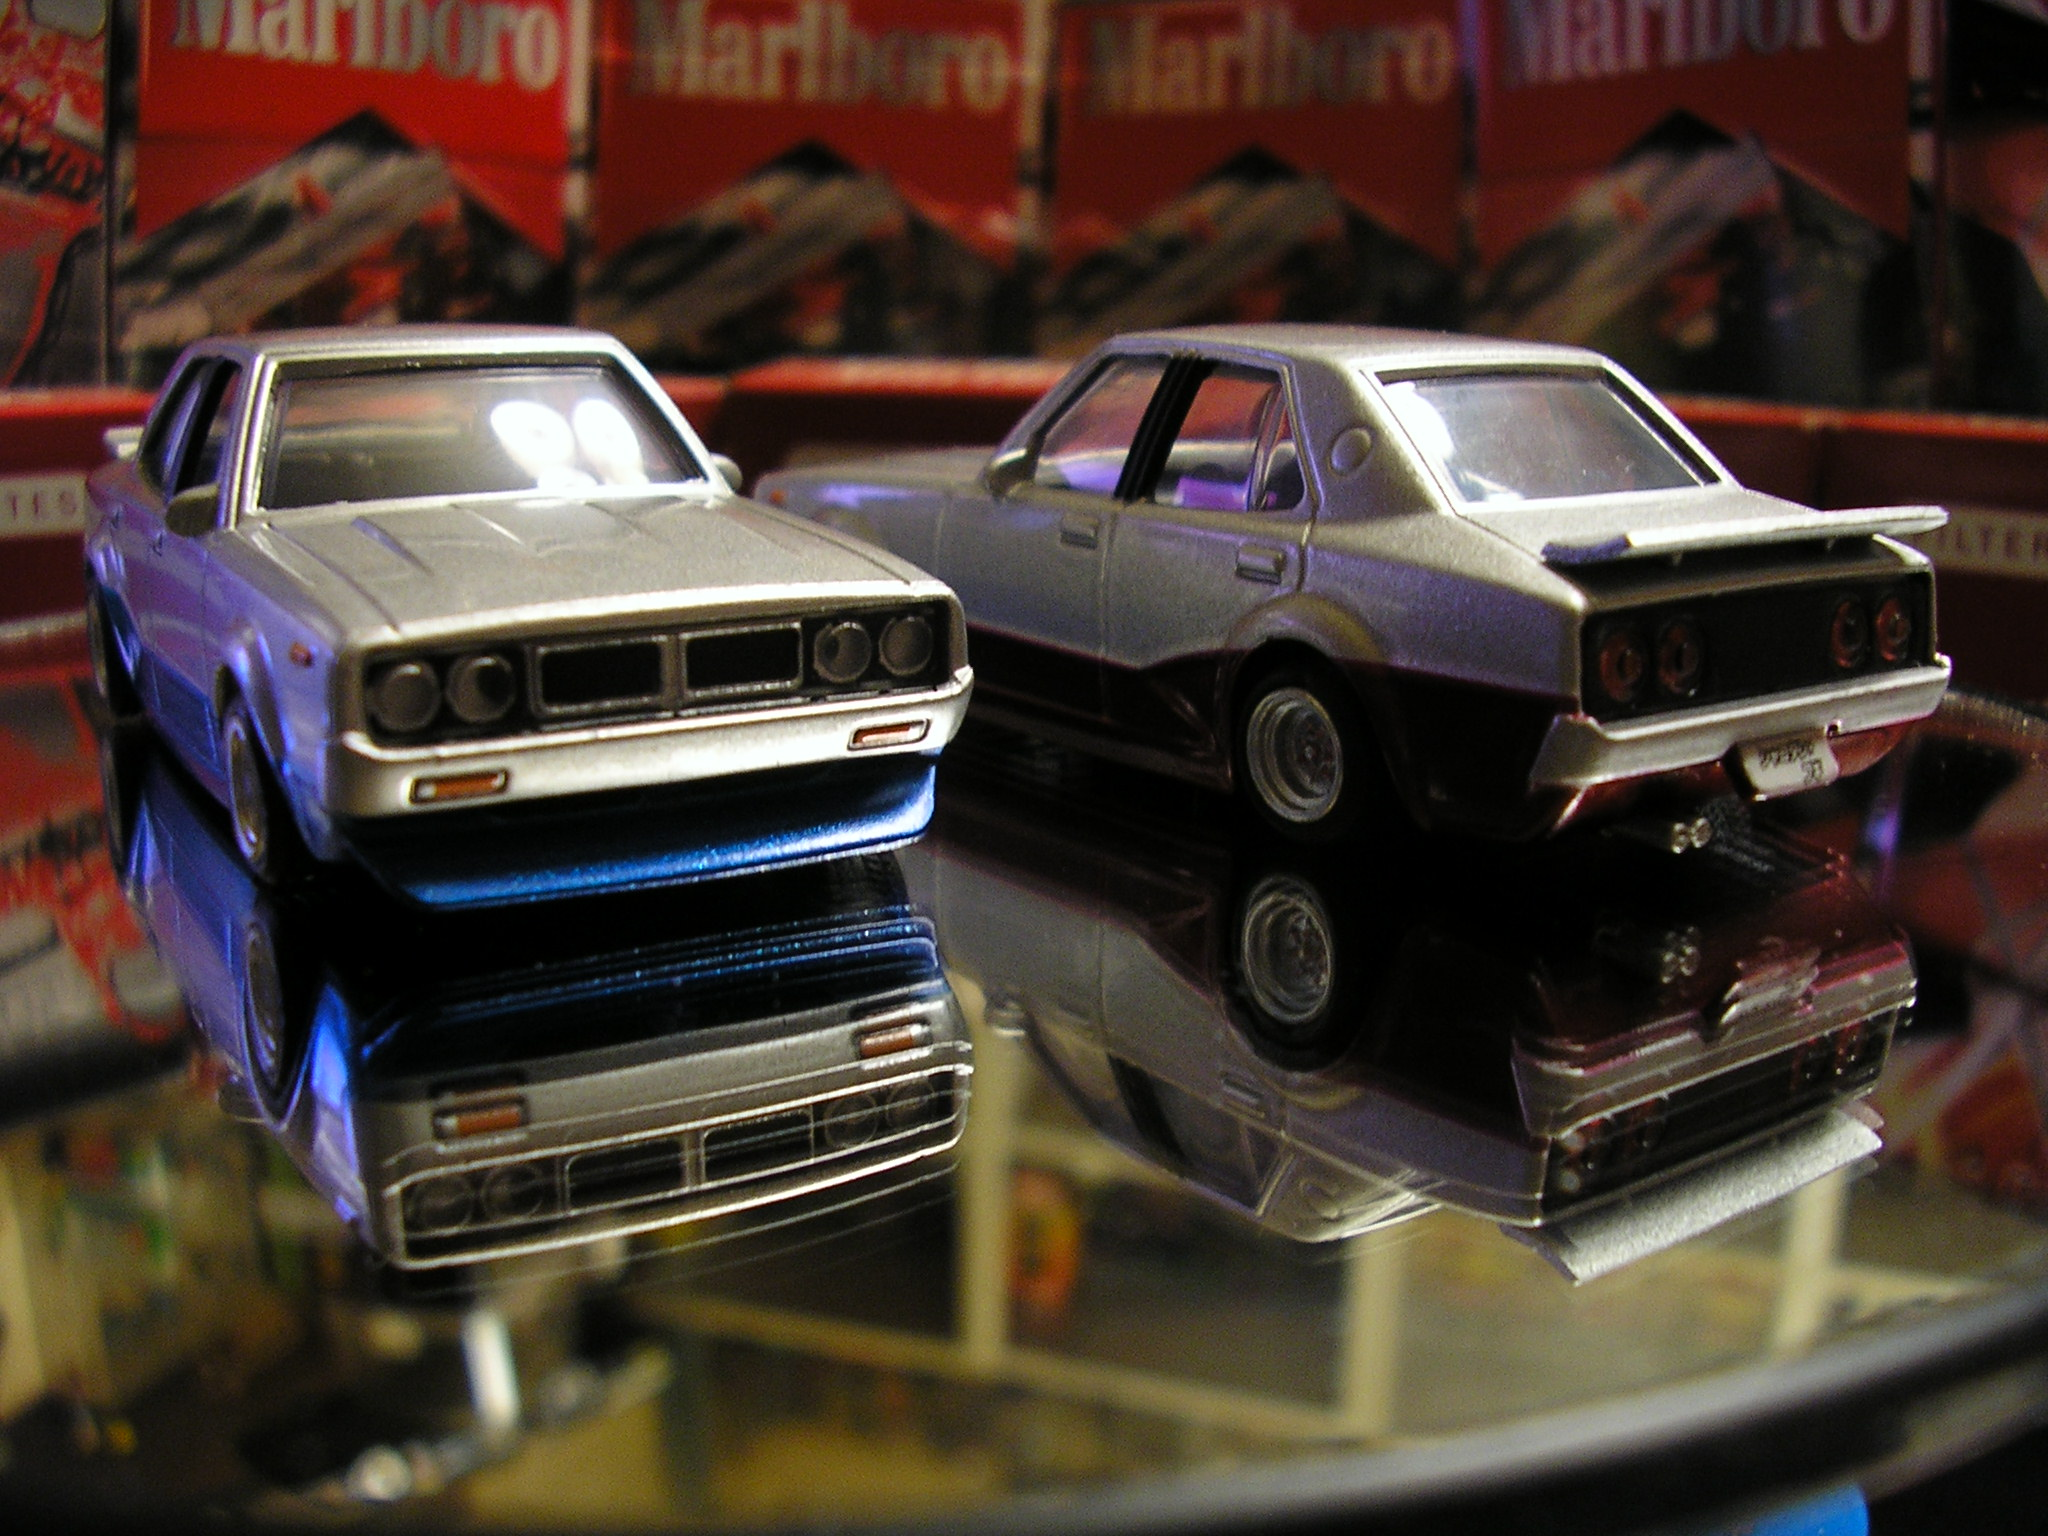 Shakotan C110 scale models